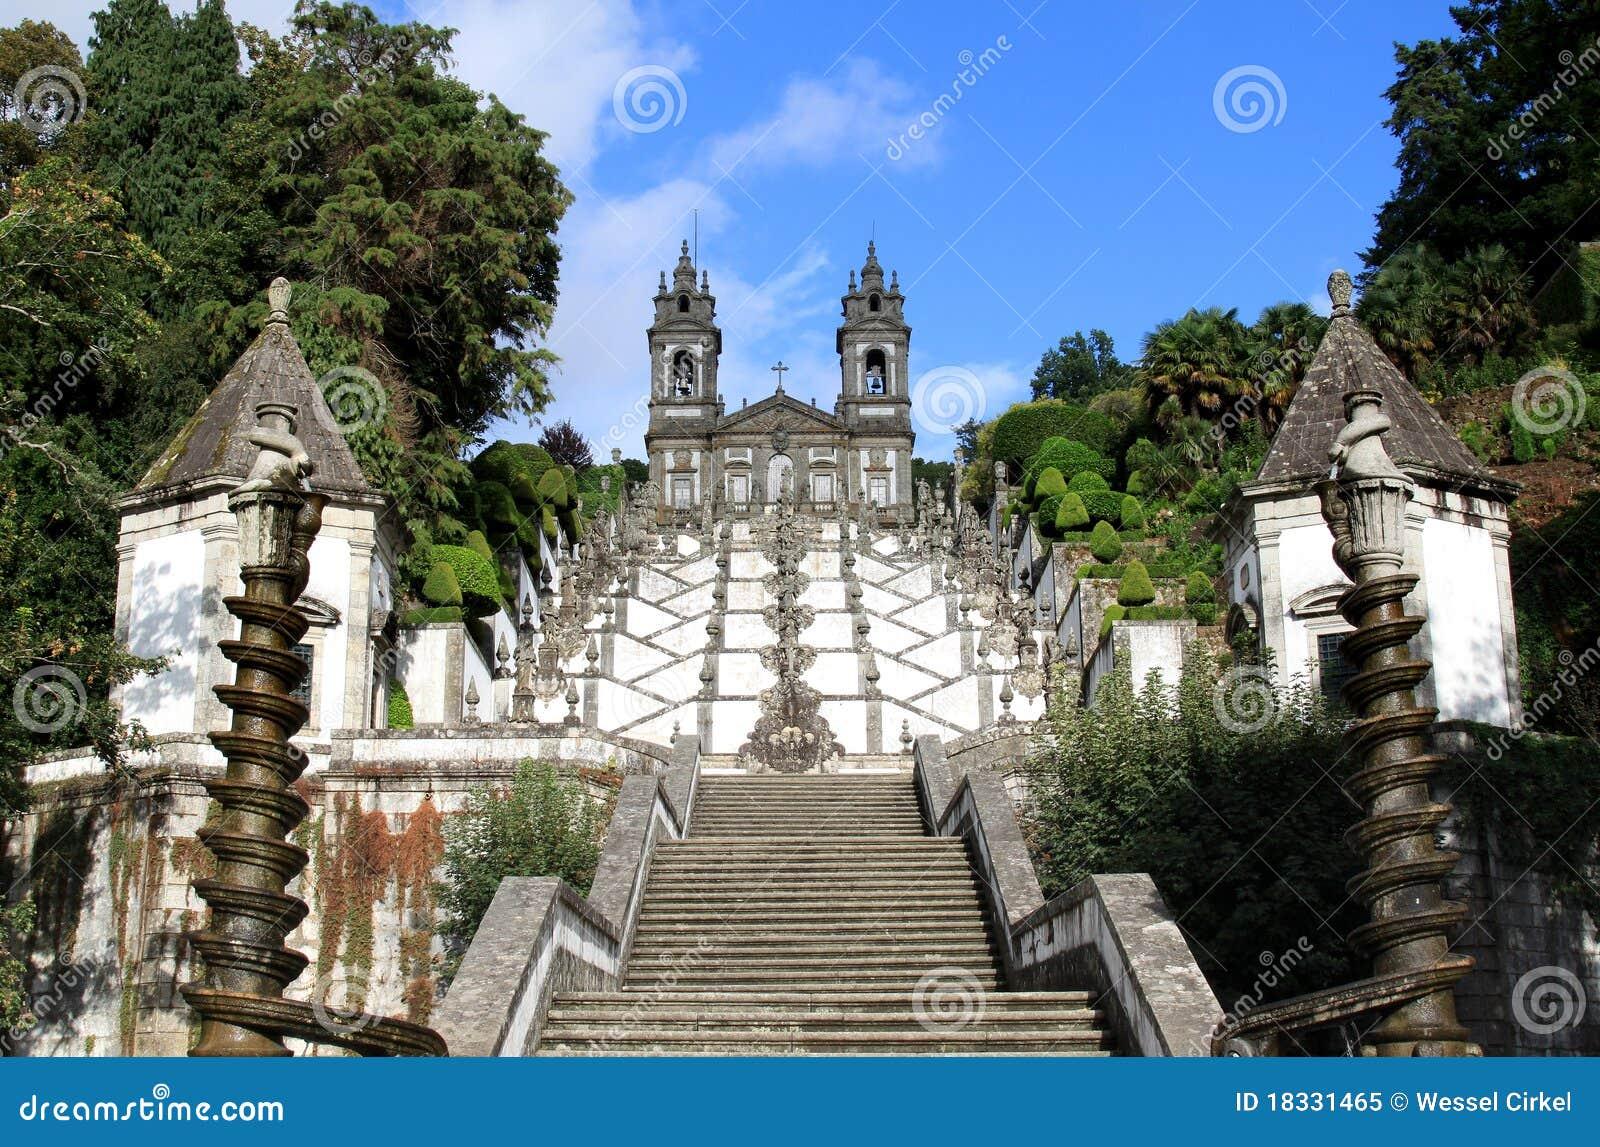 Santuario Bom Jesus do Monte dichtbij Braga, Portugal